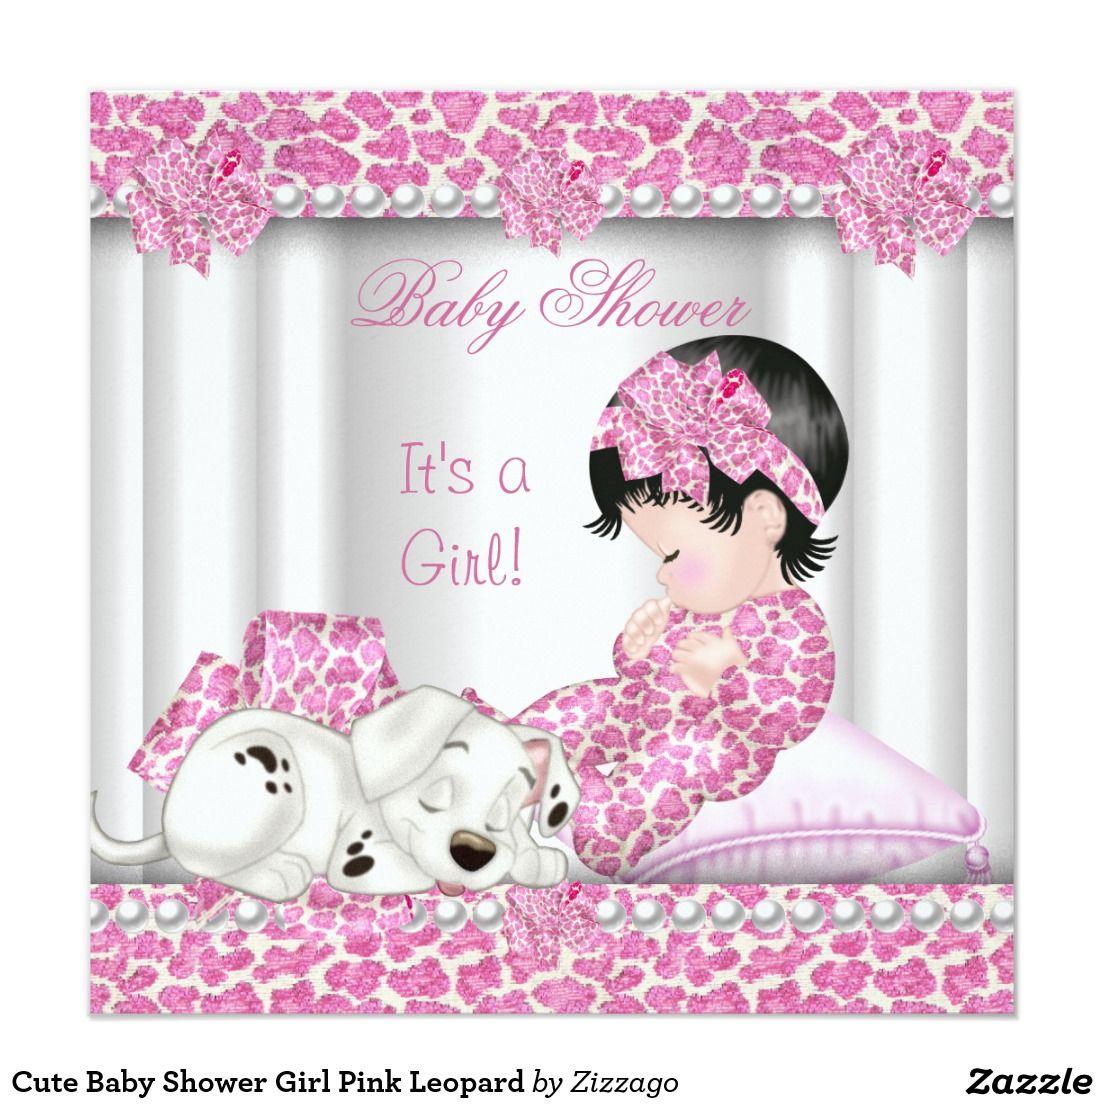 Cute Baby Shower Girl Pink Leopard Invitation Zazzle Com In 2020 Baby Shower Princess Pink Girl Pink Leopard